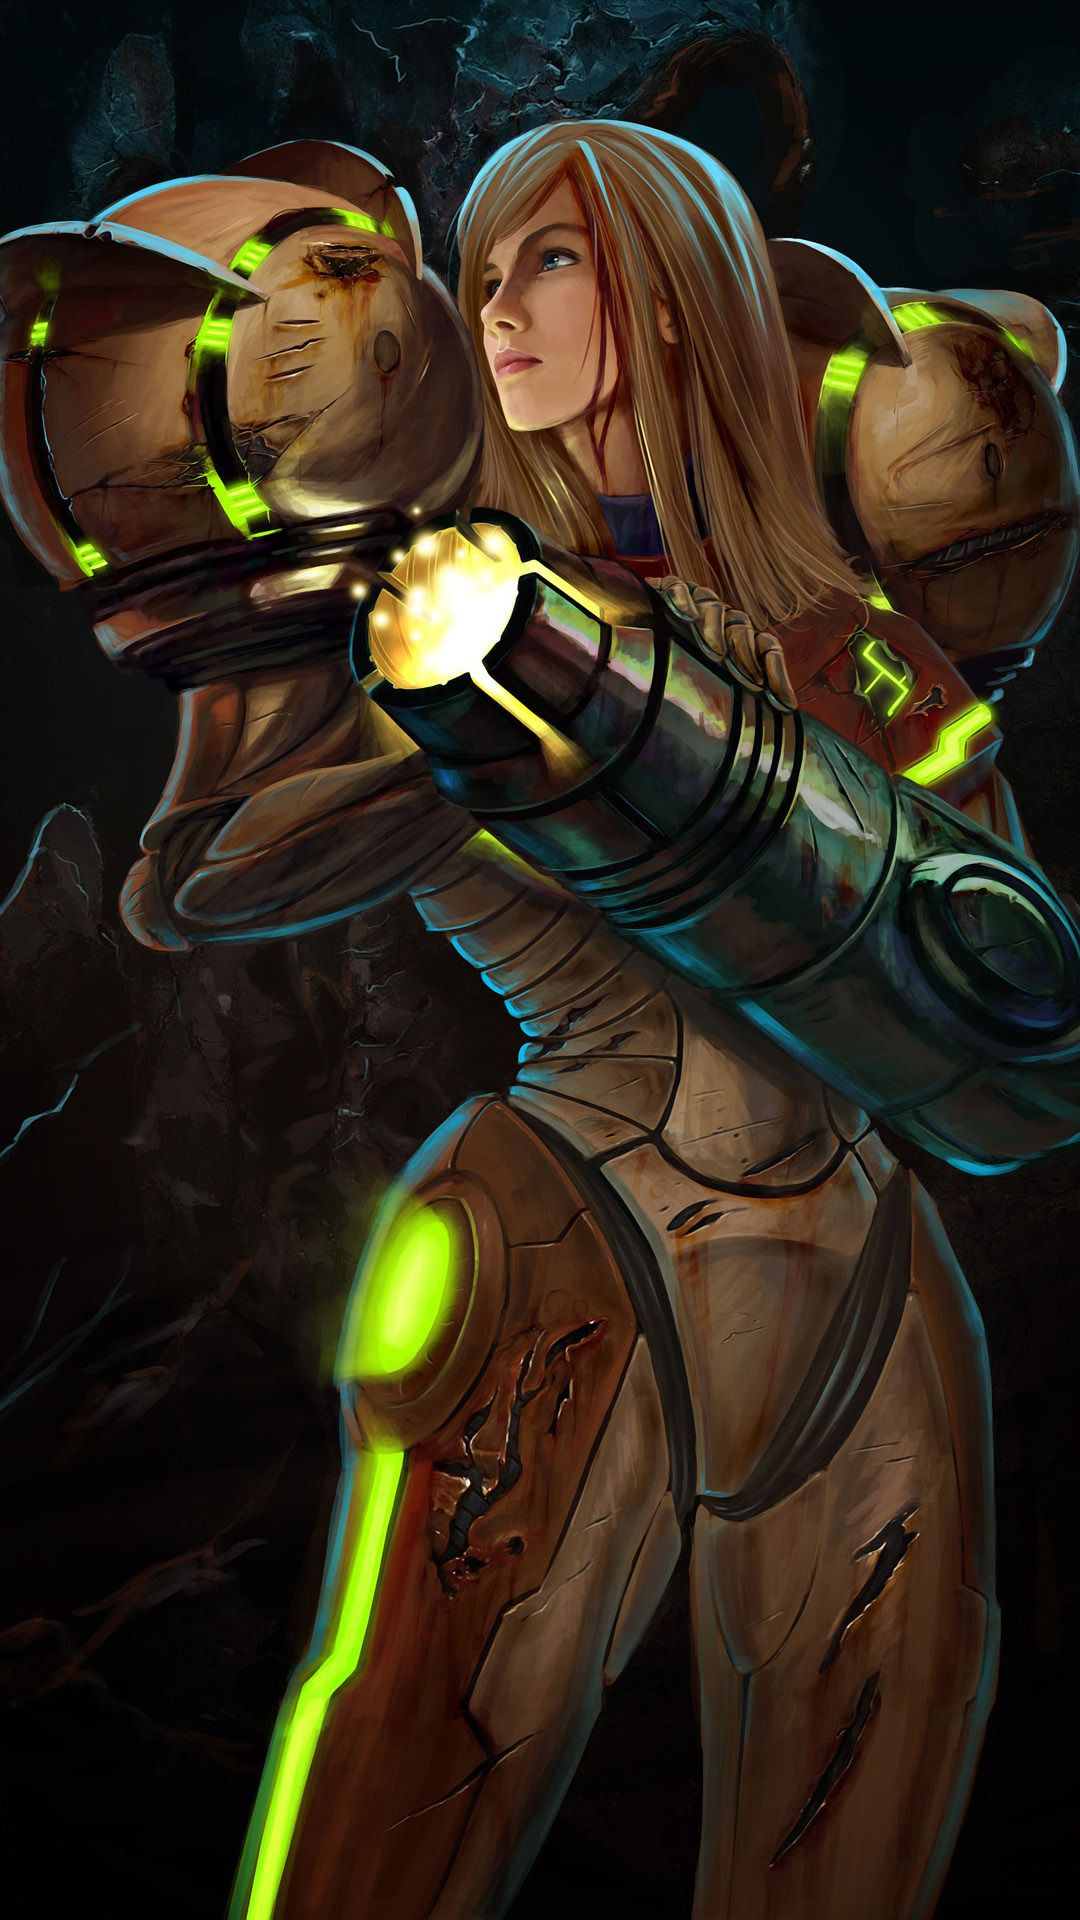 Samus Aran Mobile Wallpaper Metroid Samus Personajes De Videojuegos Personajes Animados